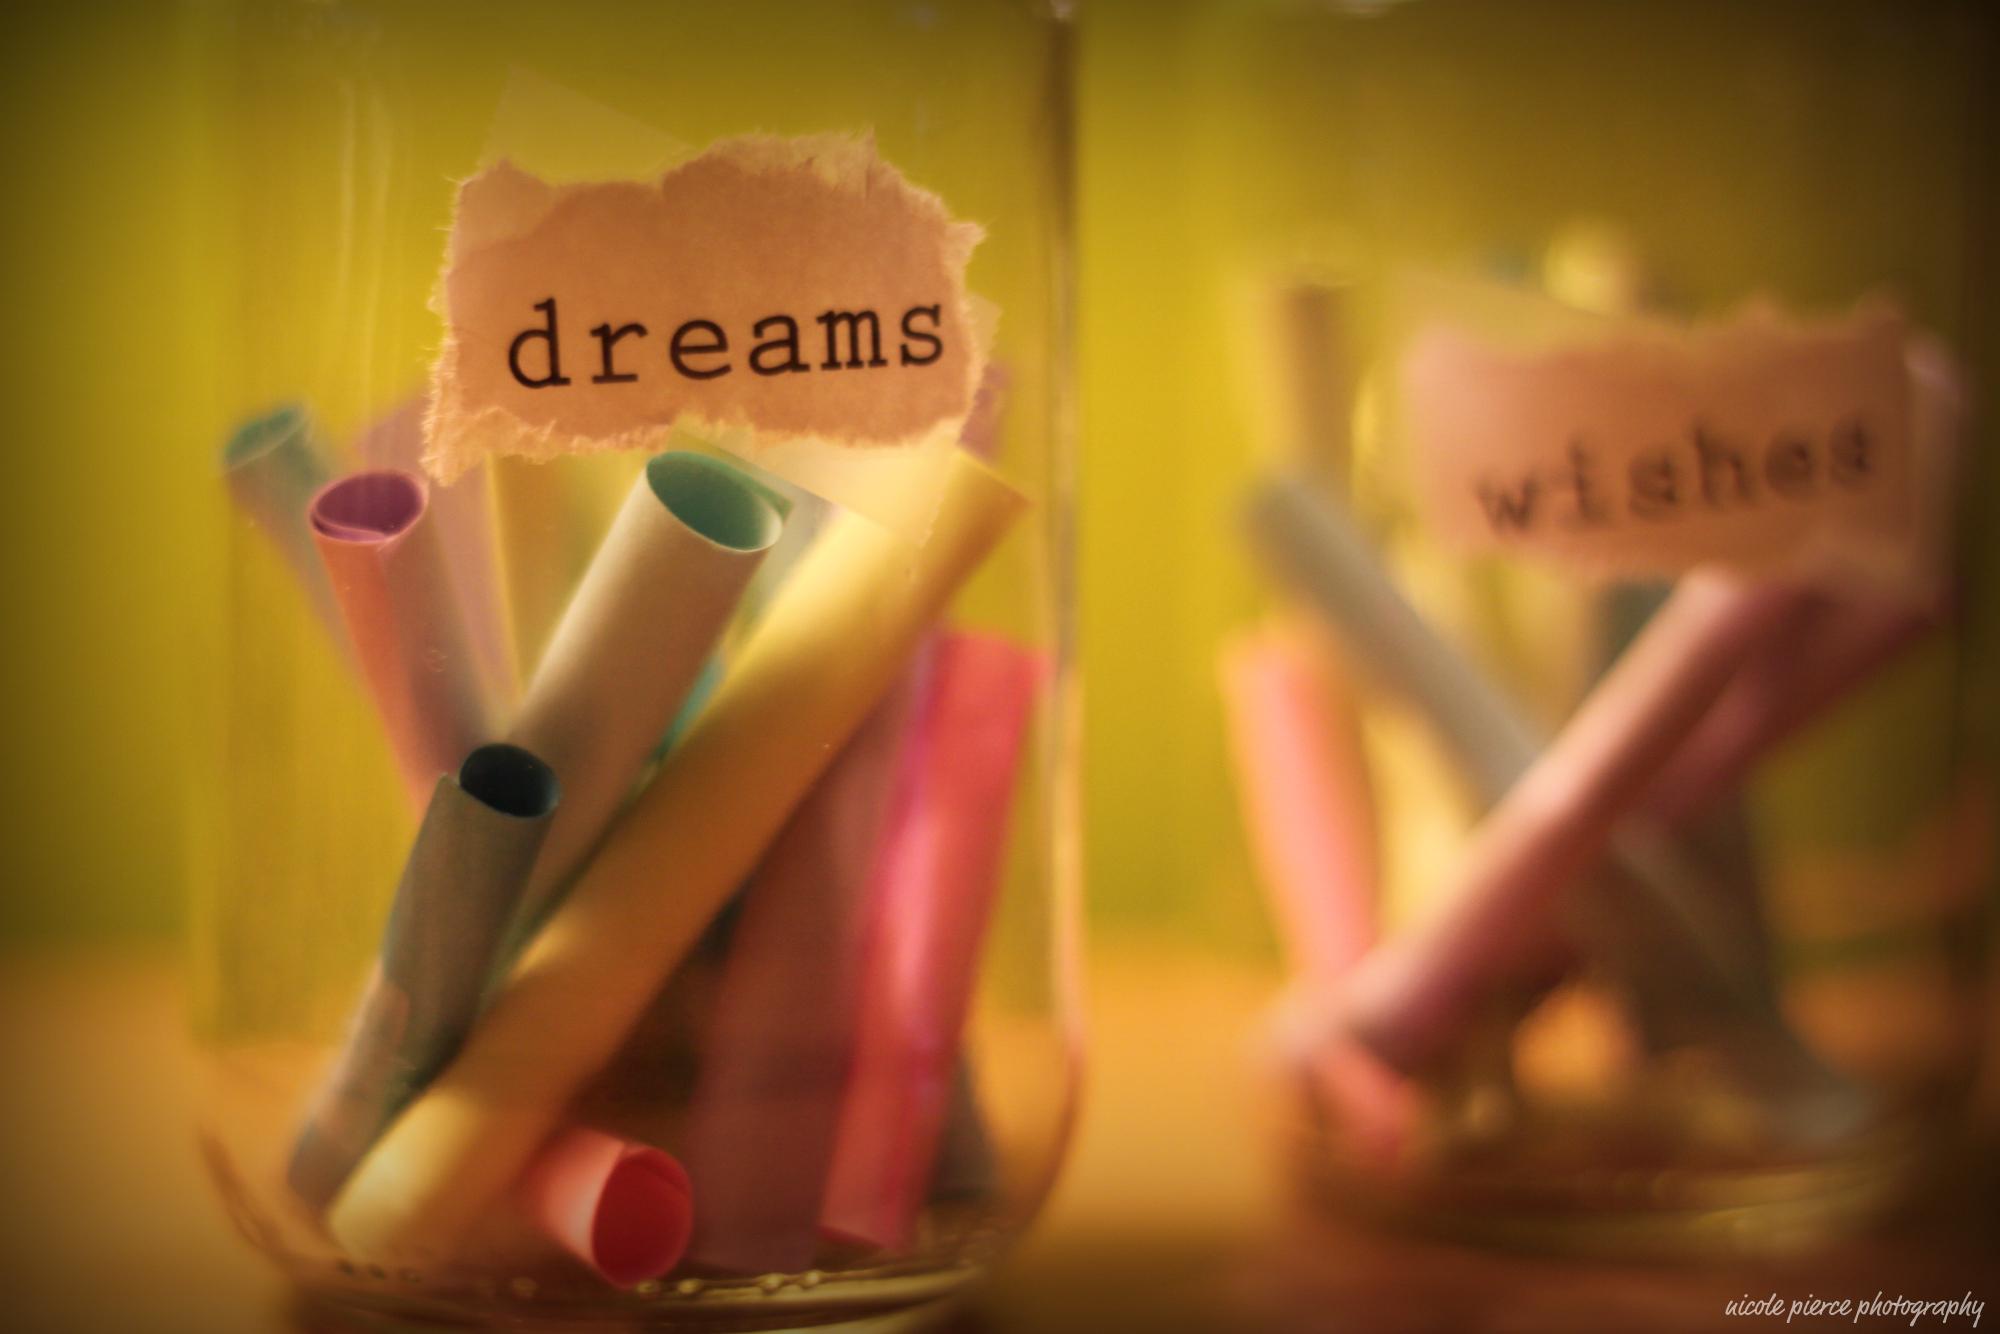 a great leader writes a new story example john sadowsky dreams nicole pierce